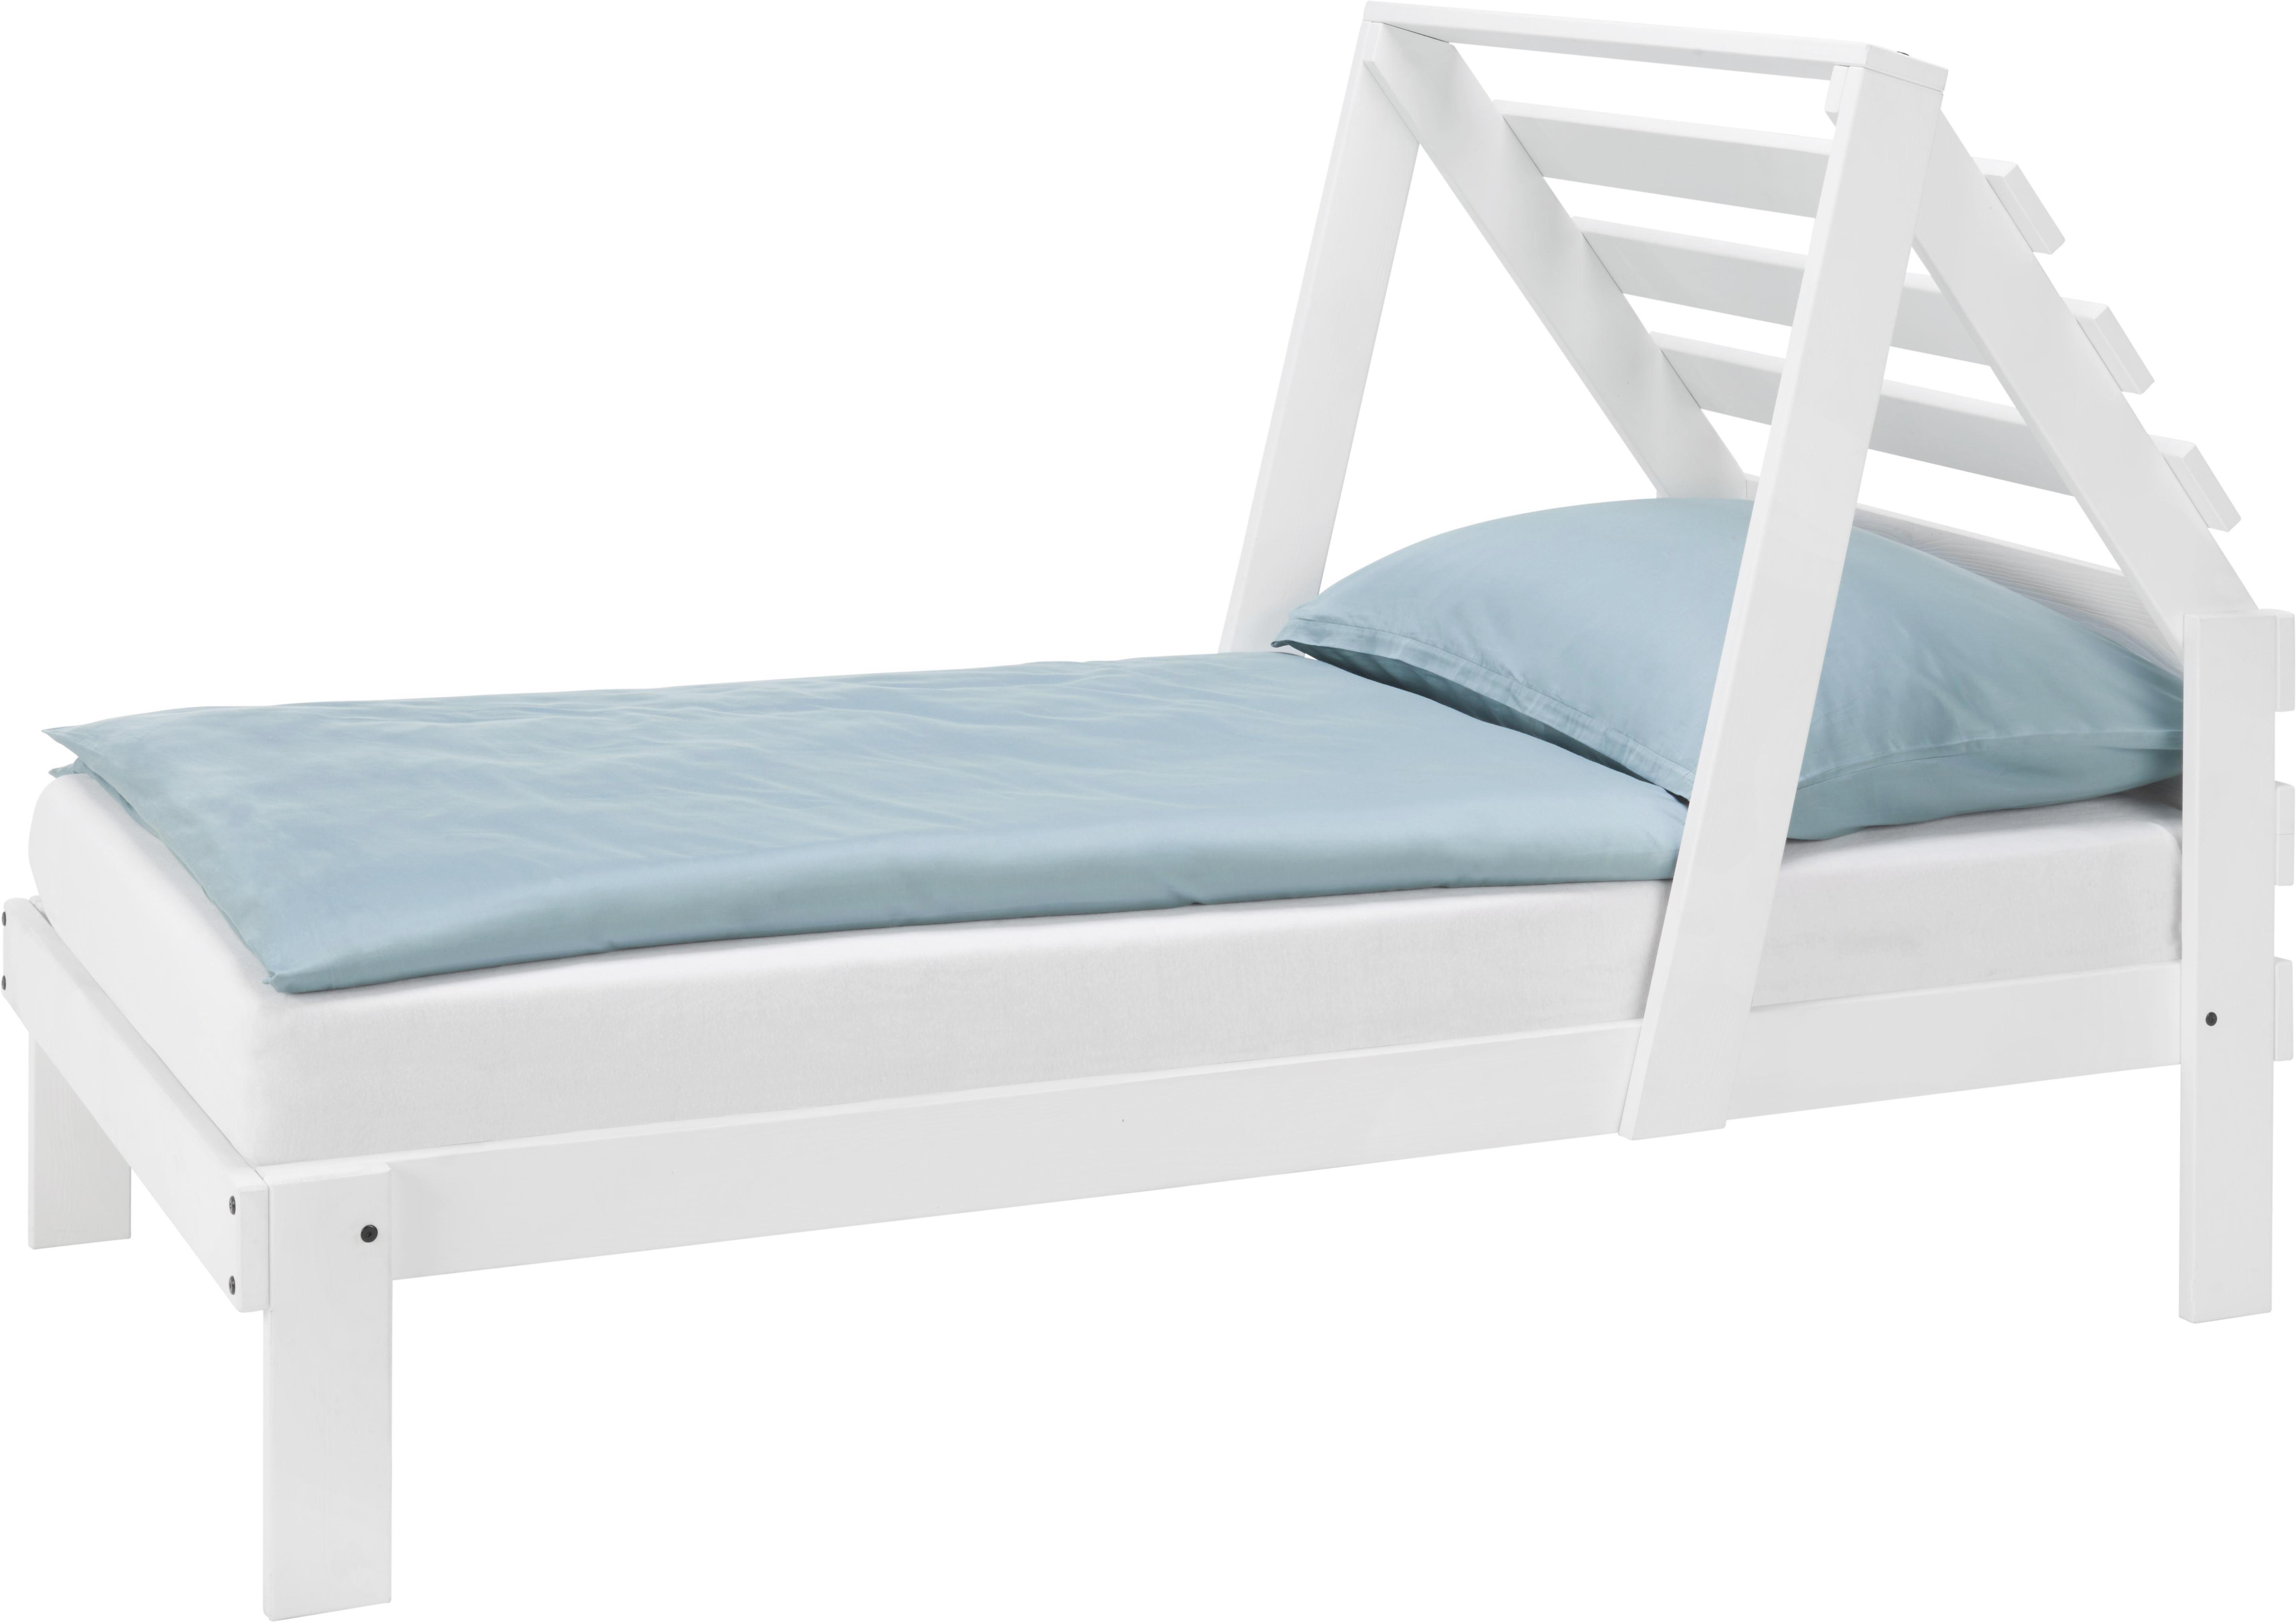 Bett in Weiß, ca. 90x200cm - Weiß, MODERN, Holz (205/165/100cm) - ZANDIARA